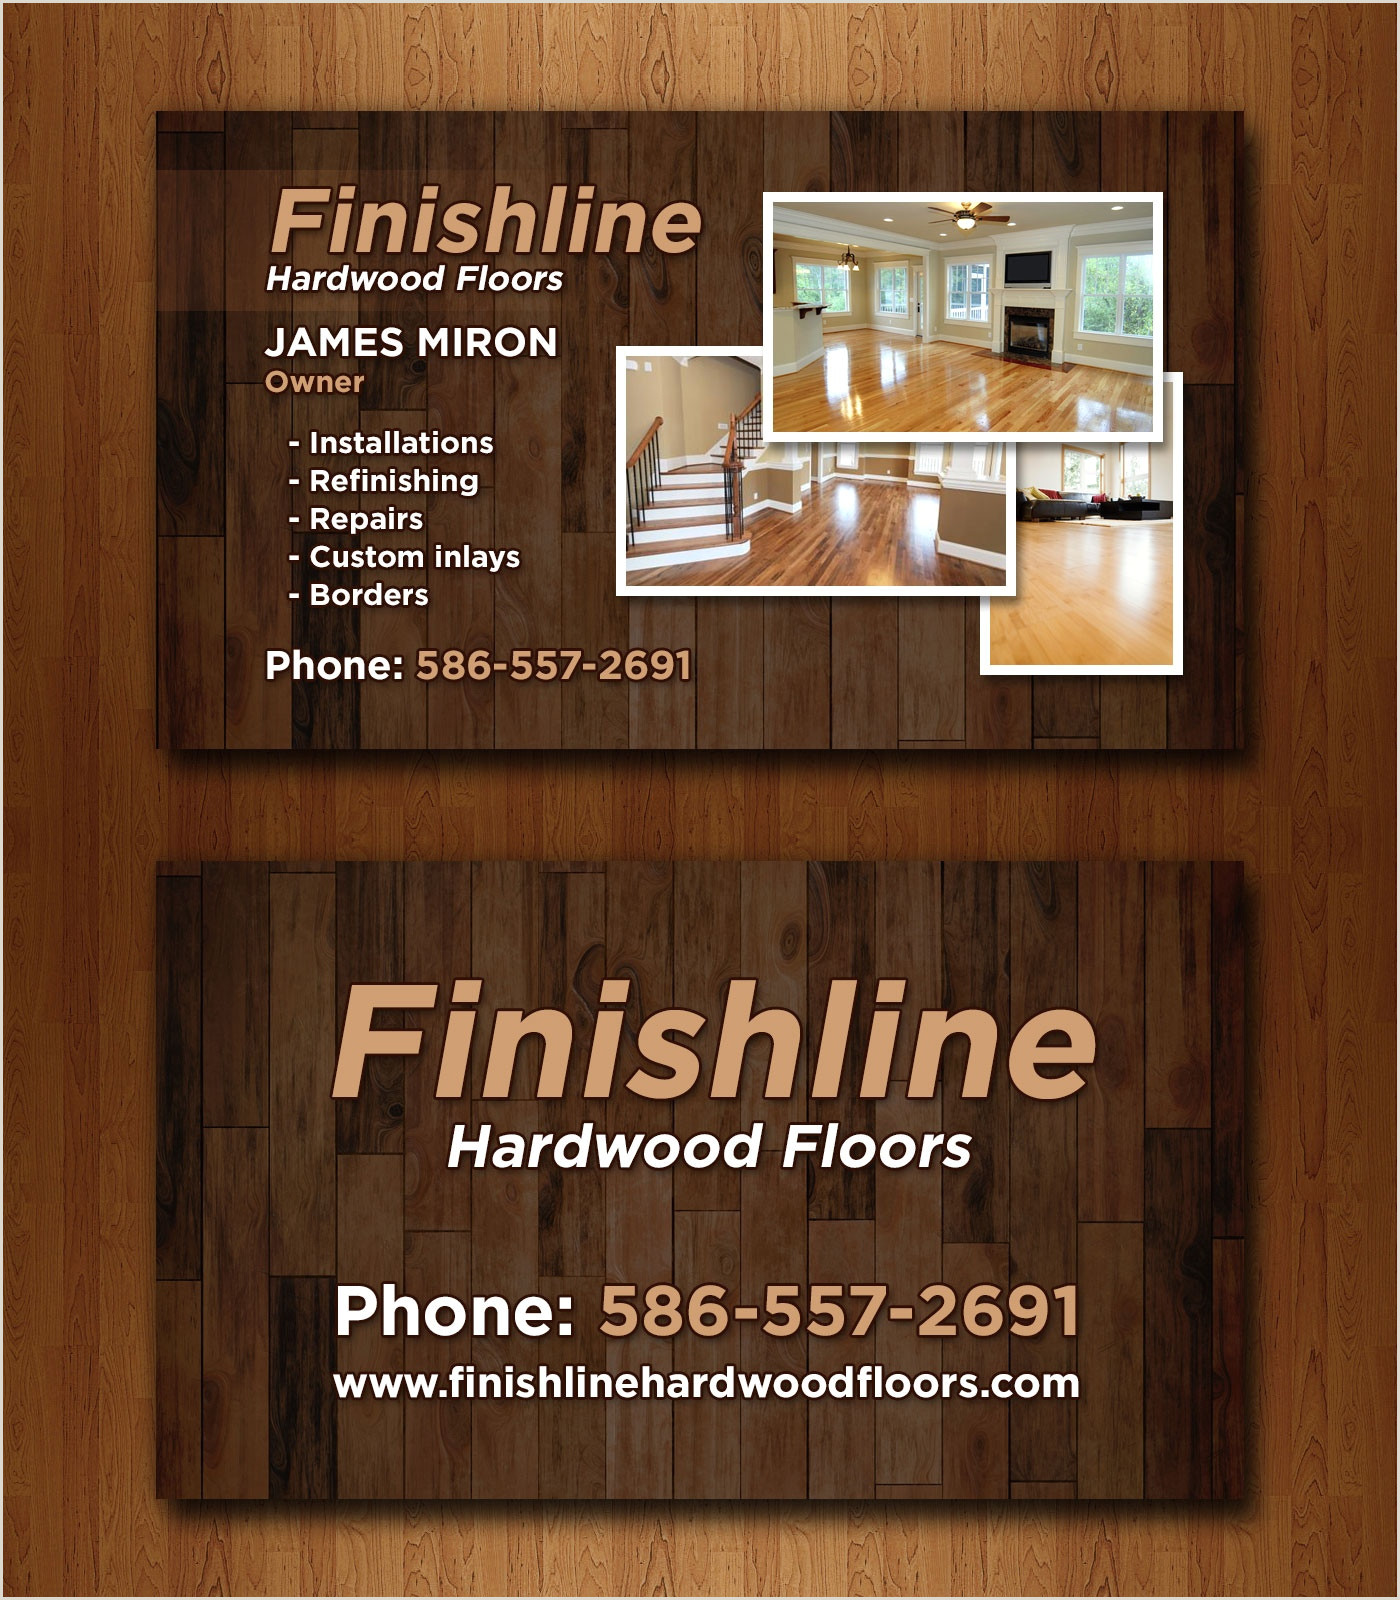 Business Cards Example 14 Popular Hardwood Flooring Business Card Template